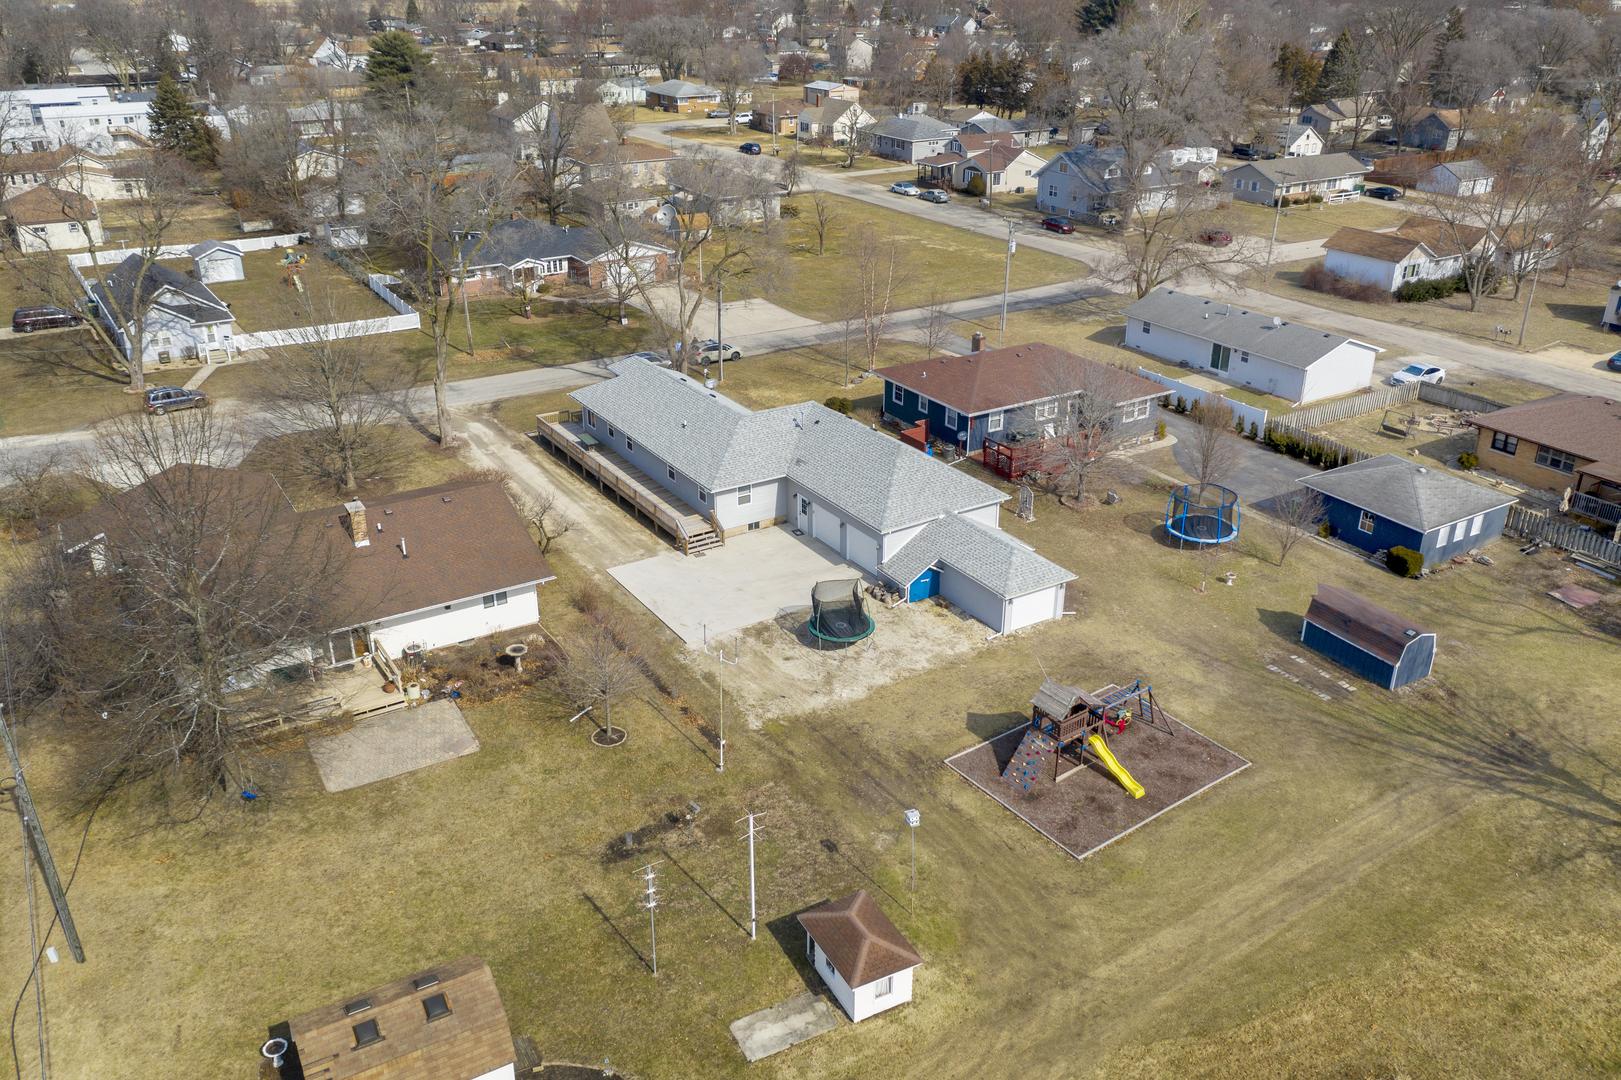 545 East 2nd, Coal City, Illinois, 60416